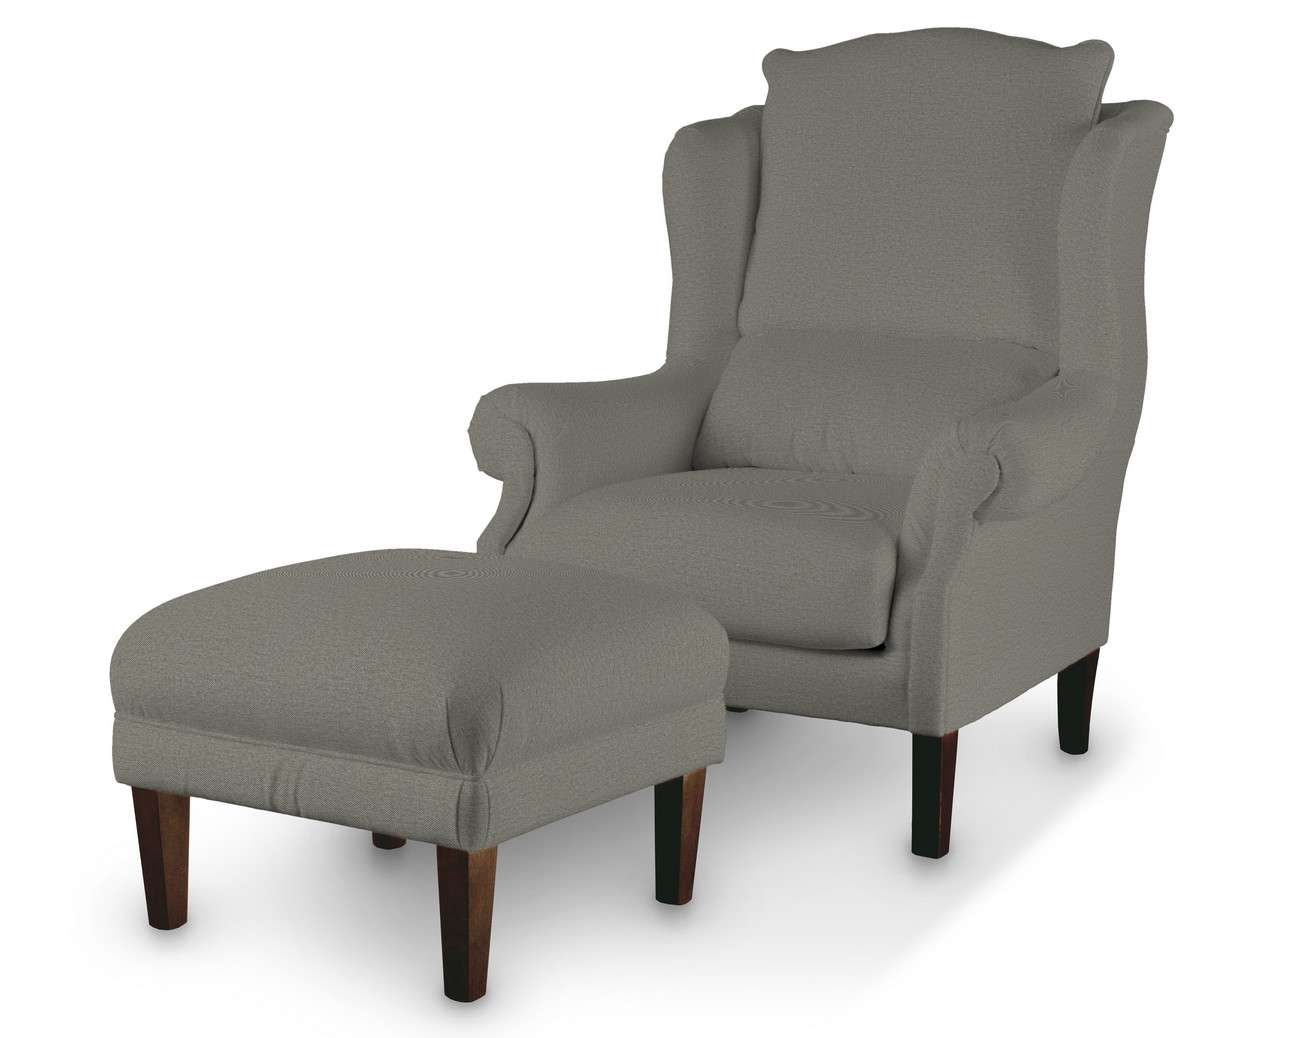 Podnóżek do fotela w kolekcji Etna, tkanina: 161-25